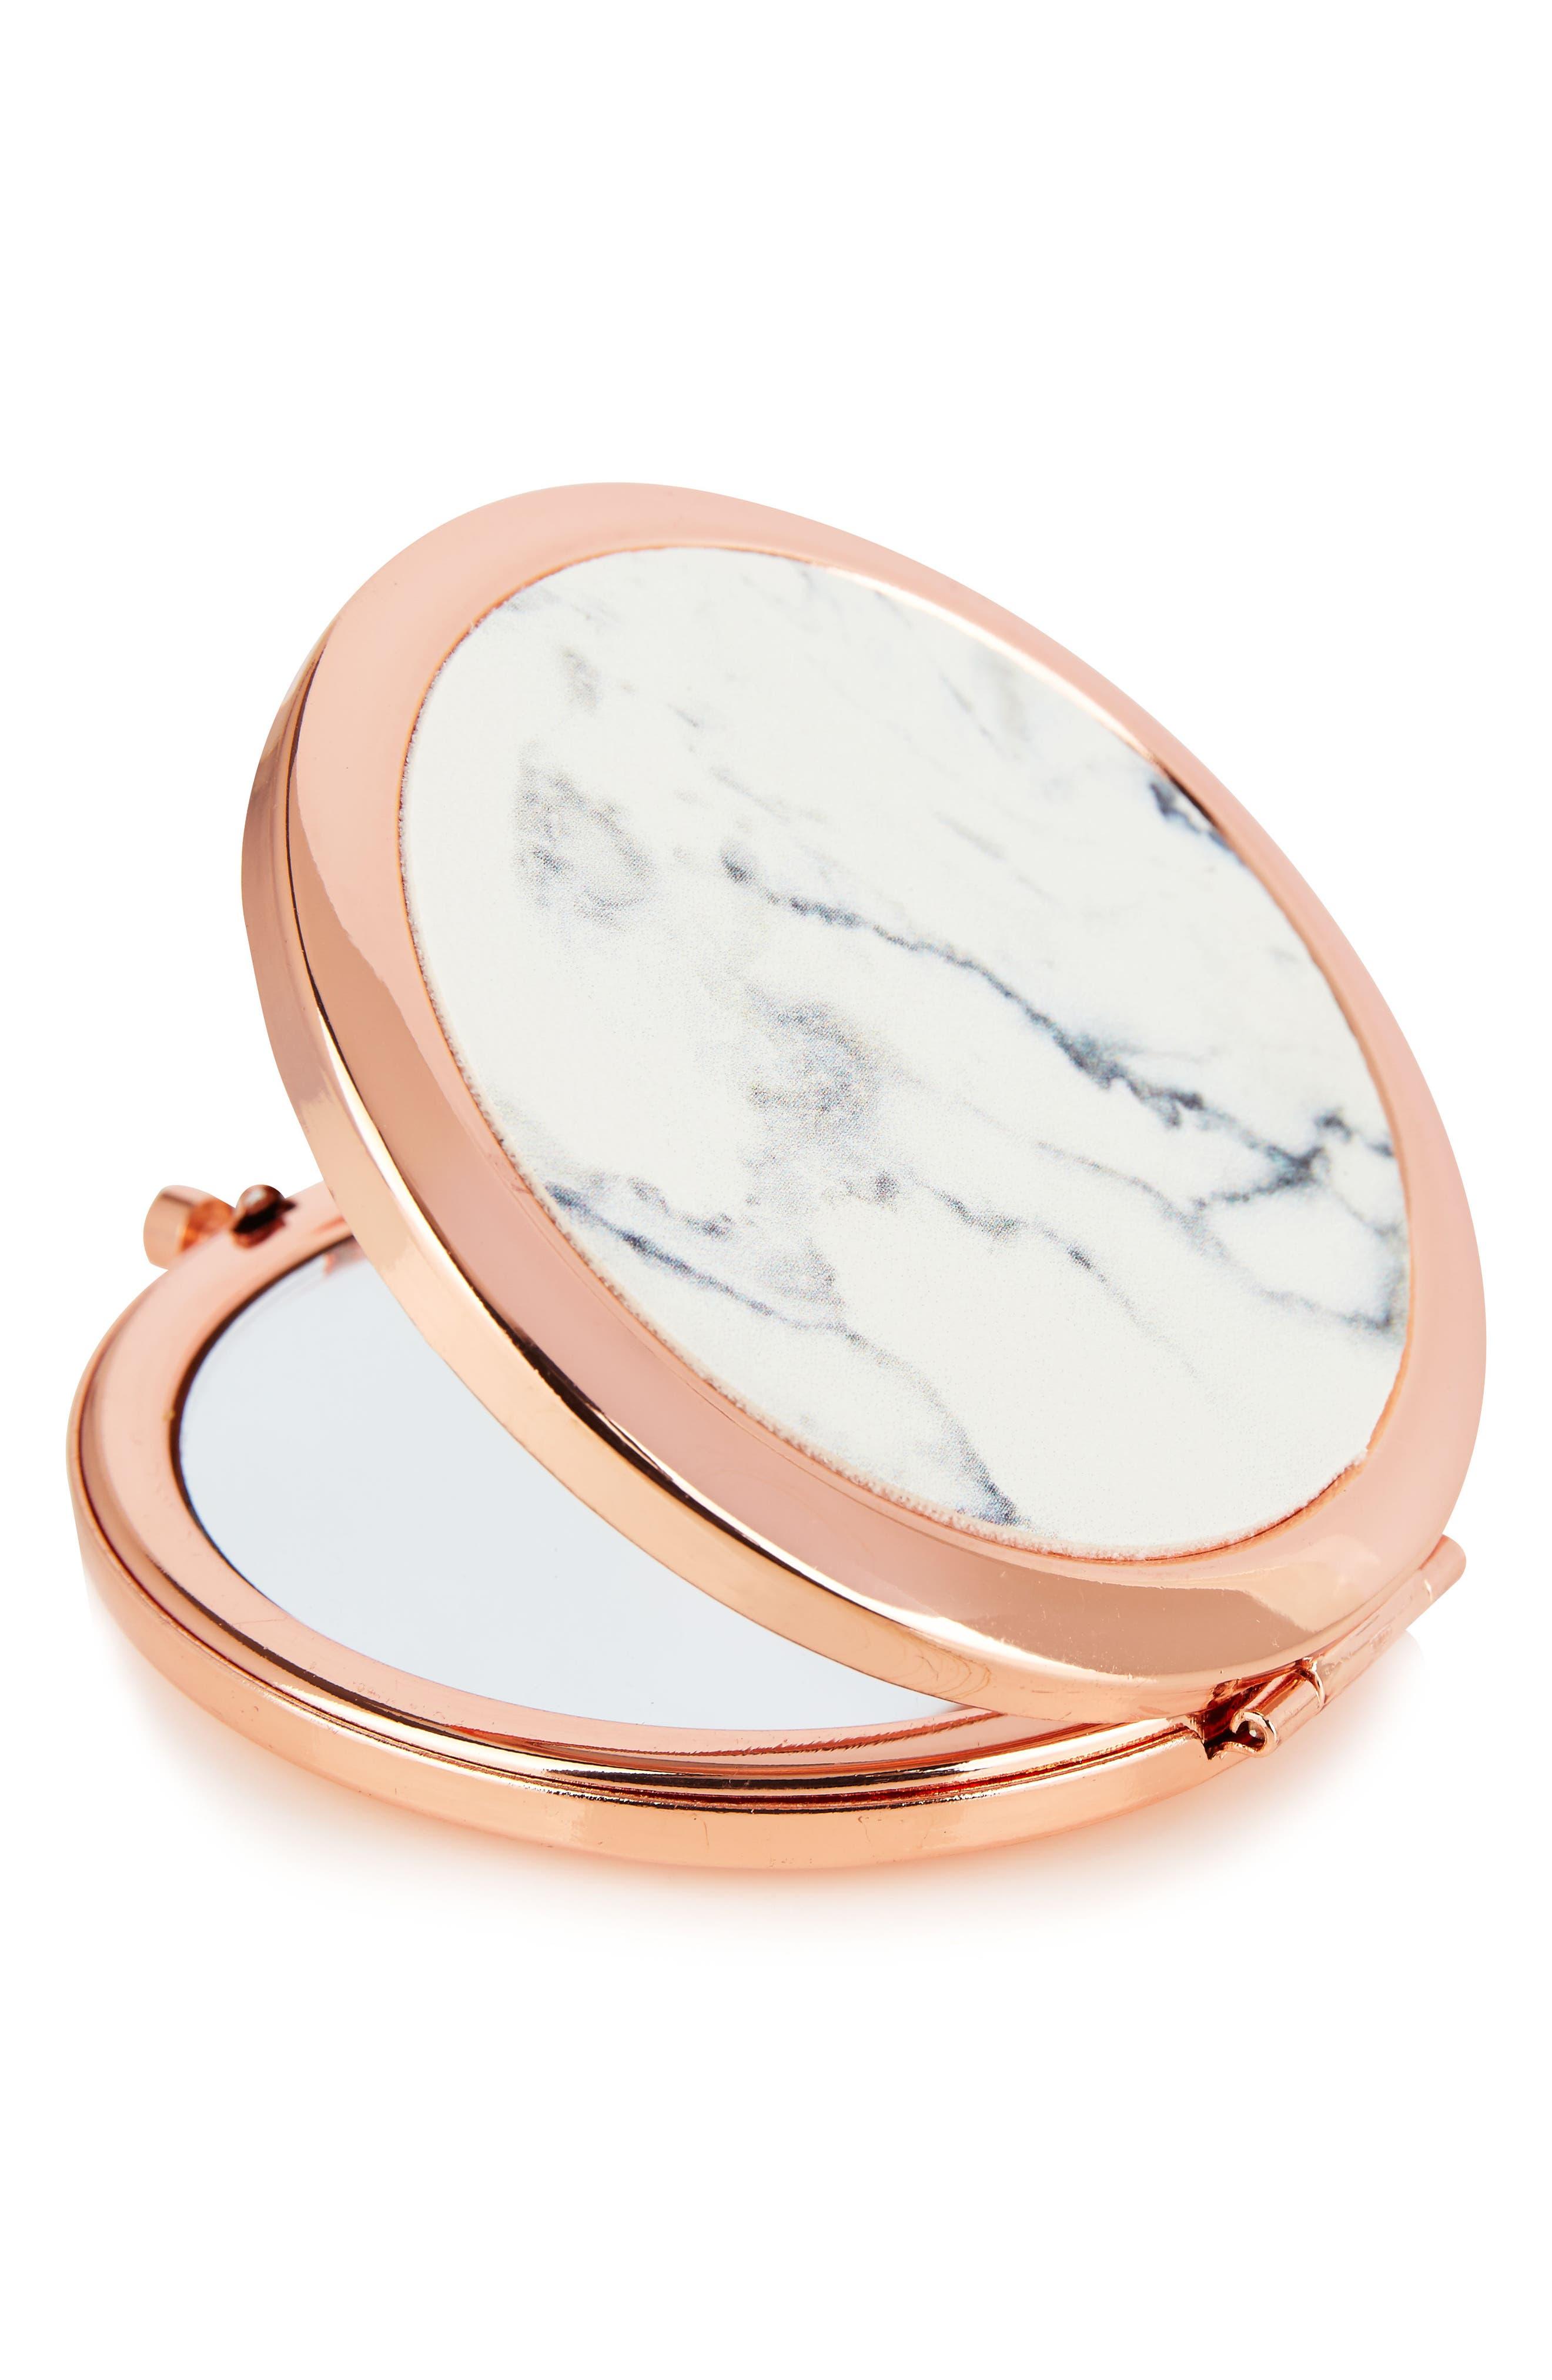 SKINNYDIP Skinny Dip Marble Compact Mirror, Main, color, 000